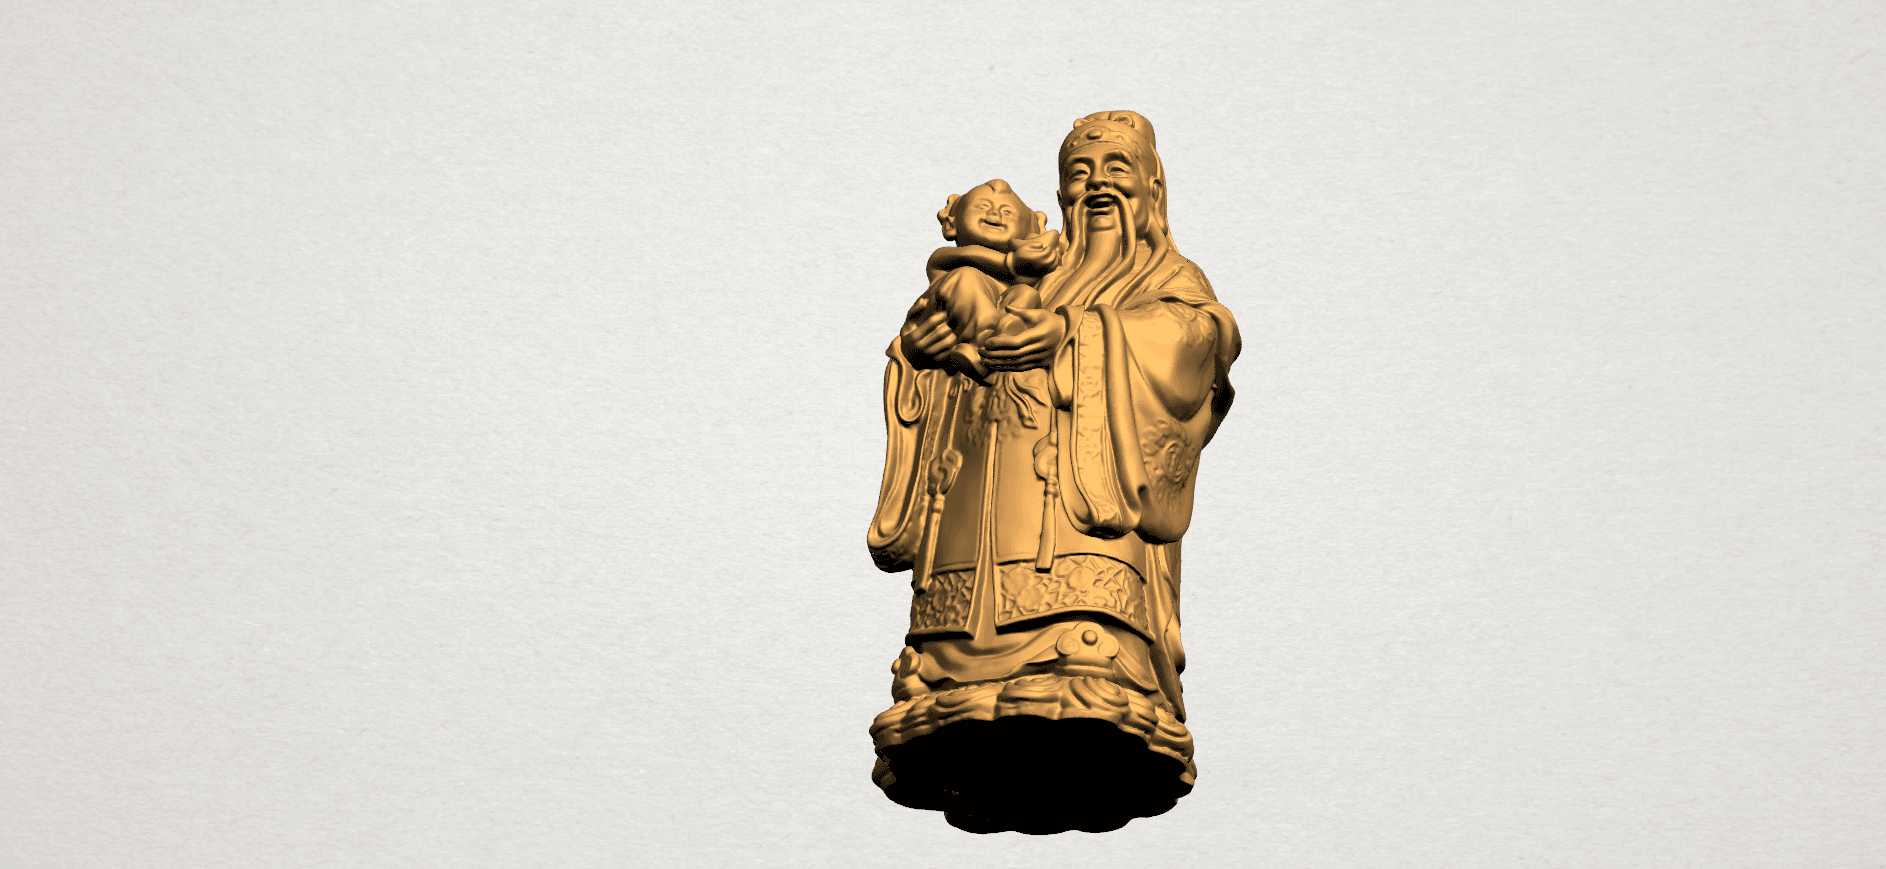 Fook (Fook Look Sao) 80mm - A08.png Télécharger fichier STL gratuit Fook (Fook Look Sao) • Design à imprimer en 3D, GeorgesNikkei